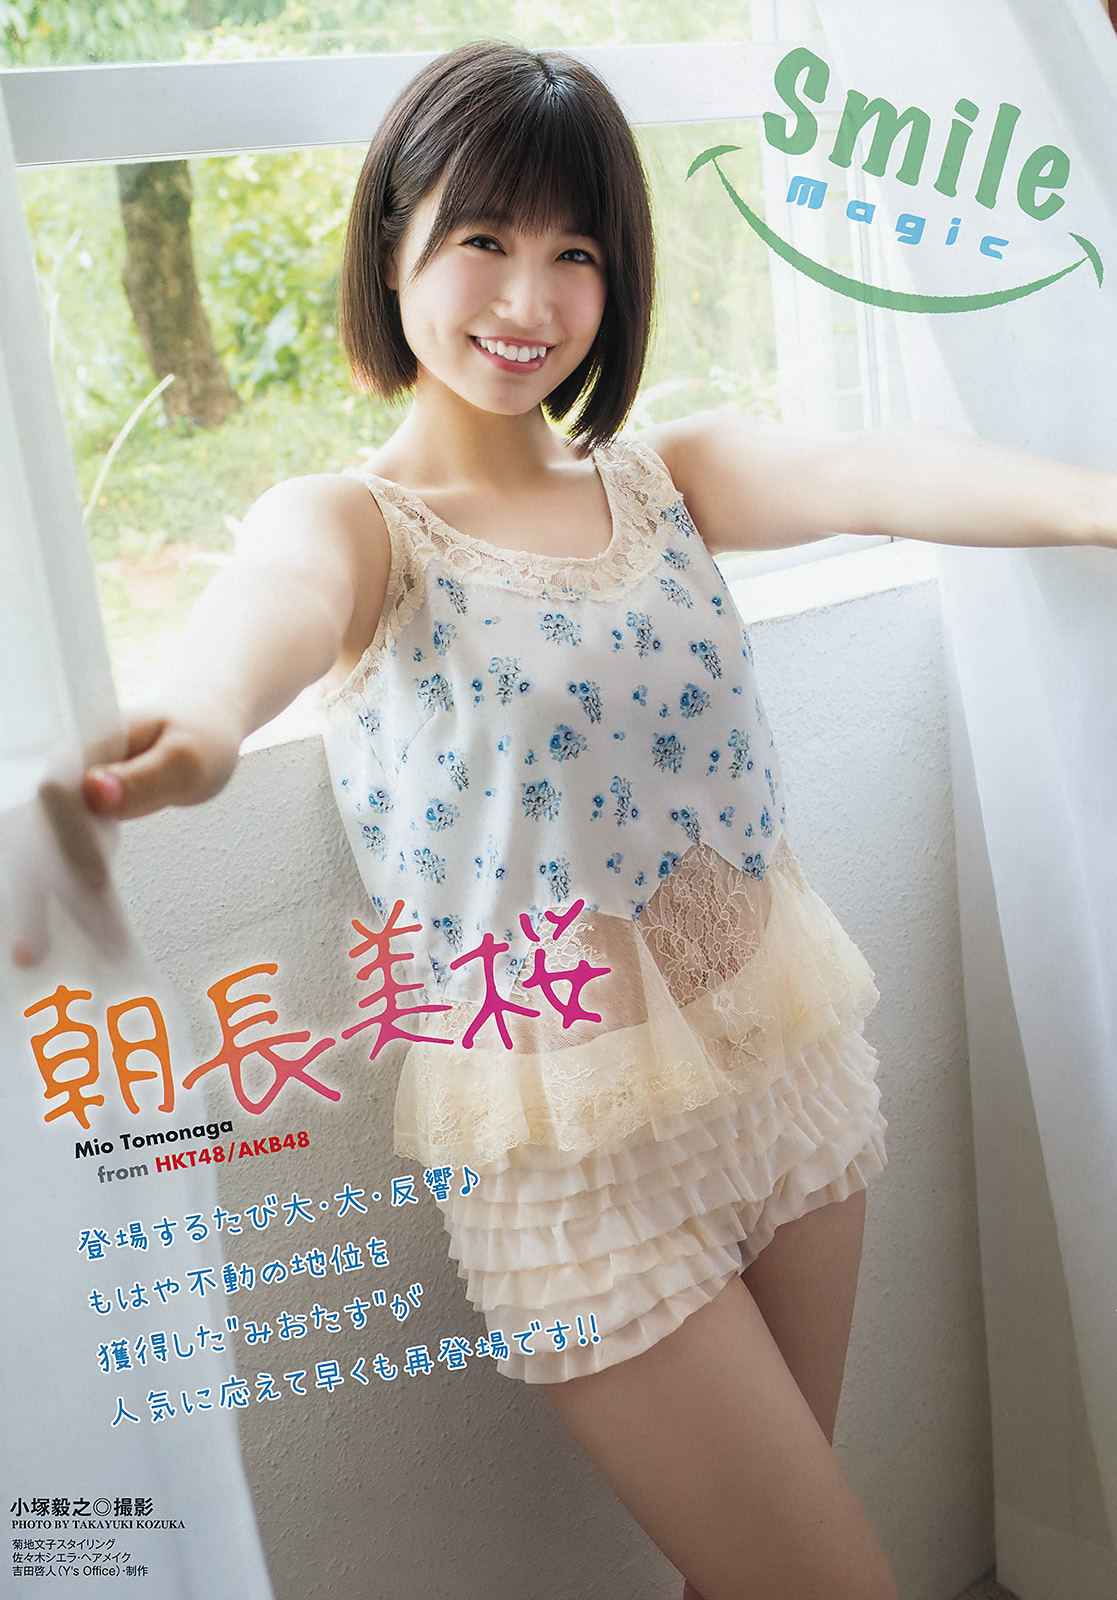 HKT48朝長美桜(19)の水着グラビア、キャバ嬢姿のエロ画像50枚・14枚目の画像